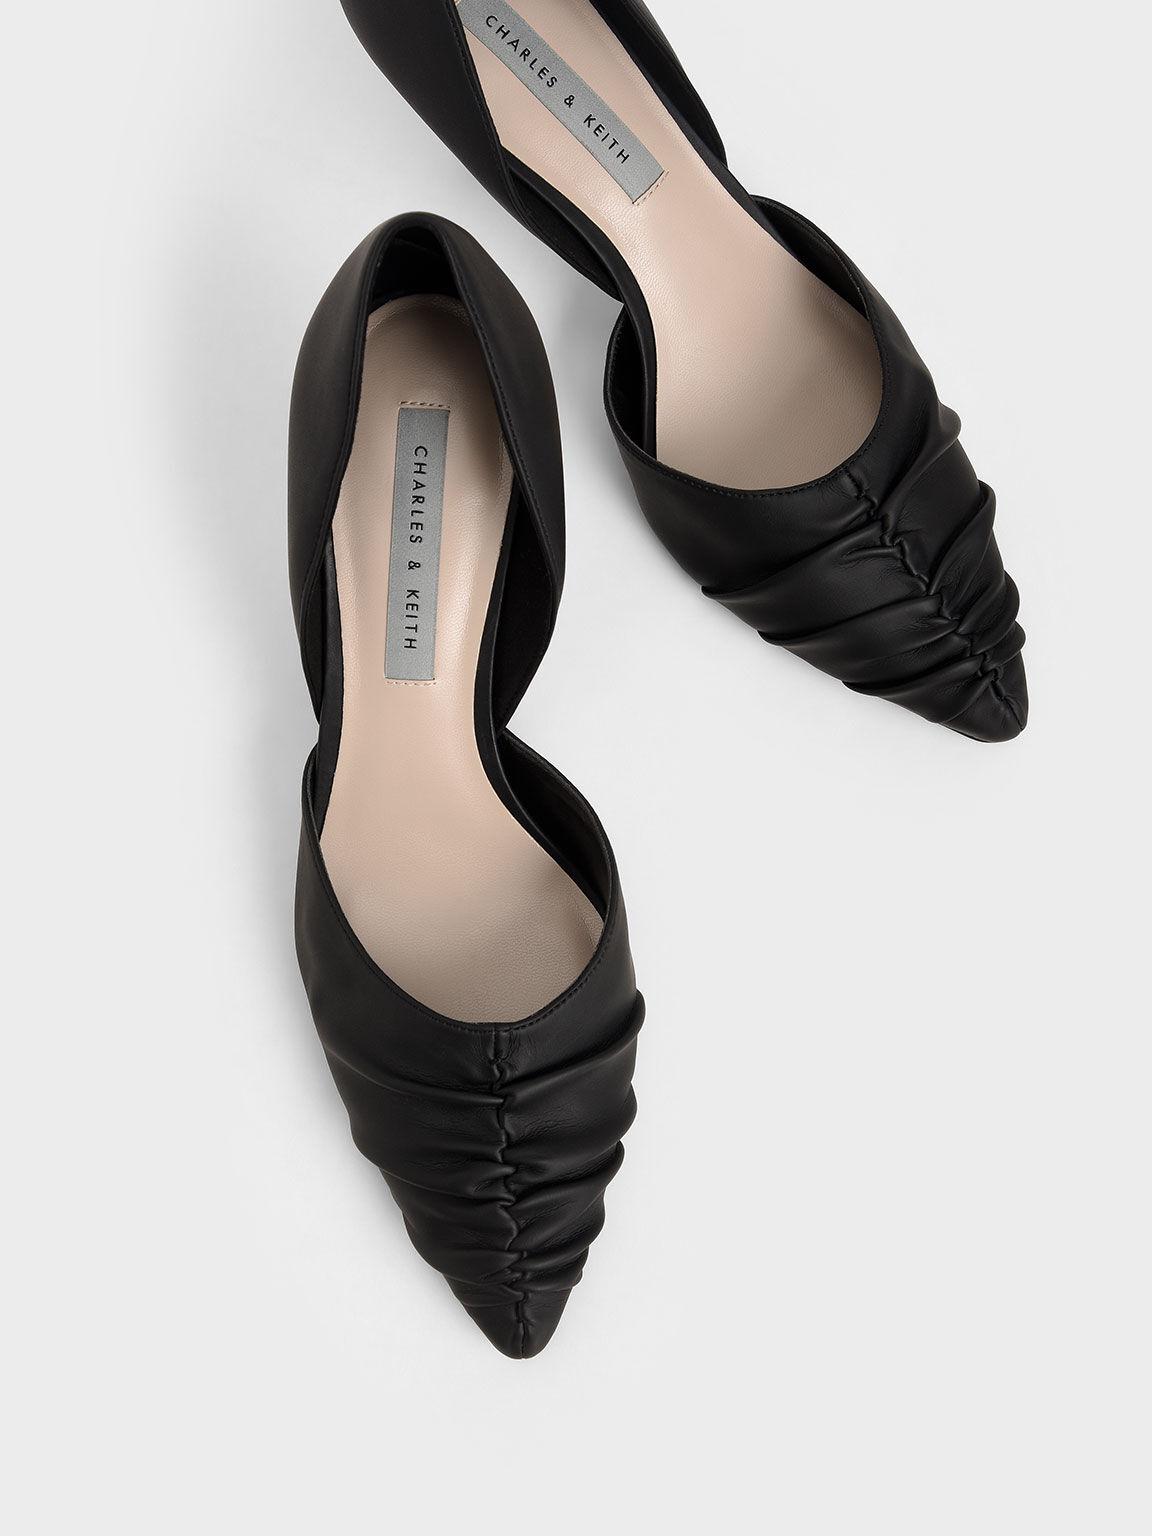 Ruched D'Orsay Court Shoes, Black, hi-res